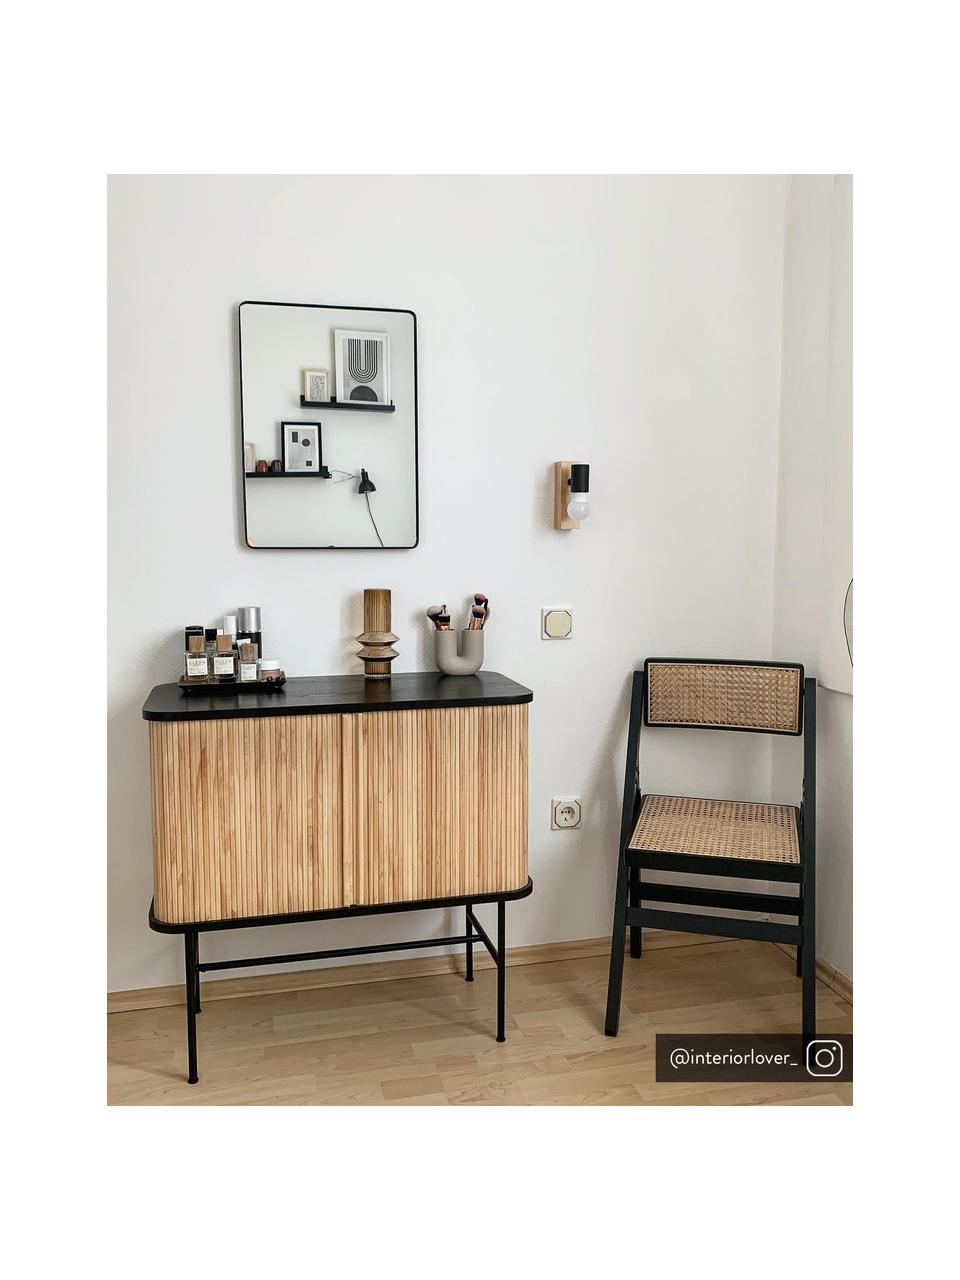 Wandleuchte Townshend aus Holz, Schwarz, Holz, 5 x 17 cm